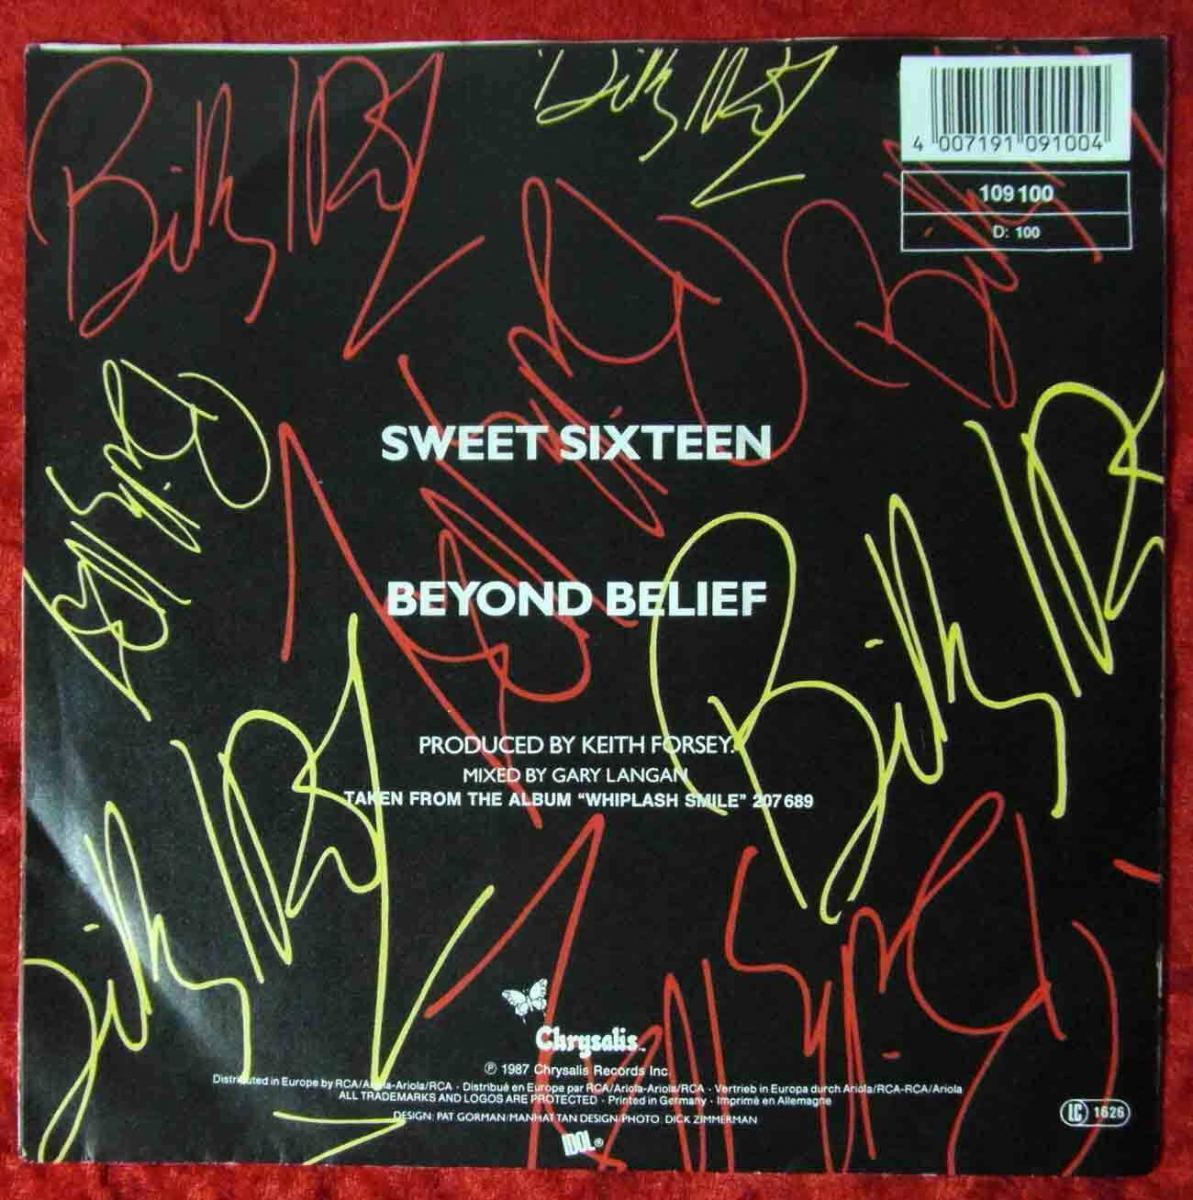 Single Billy Idol: Sweet Sixteen (Chrysalis 109 100) D 1987 1